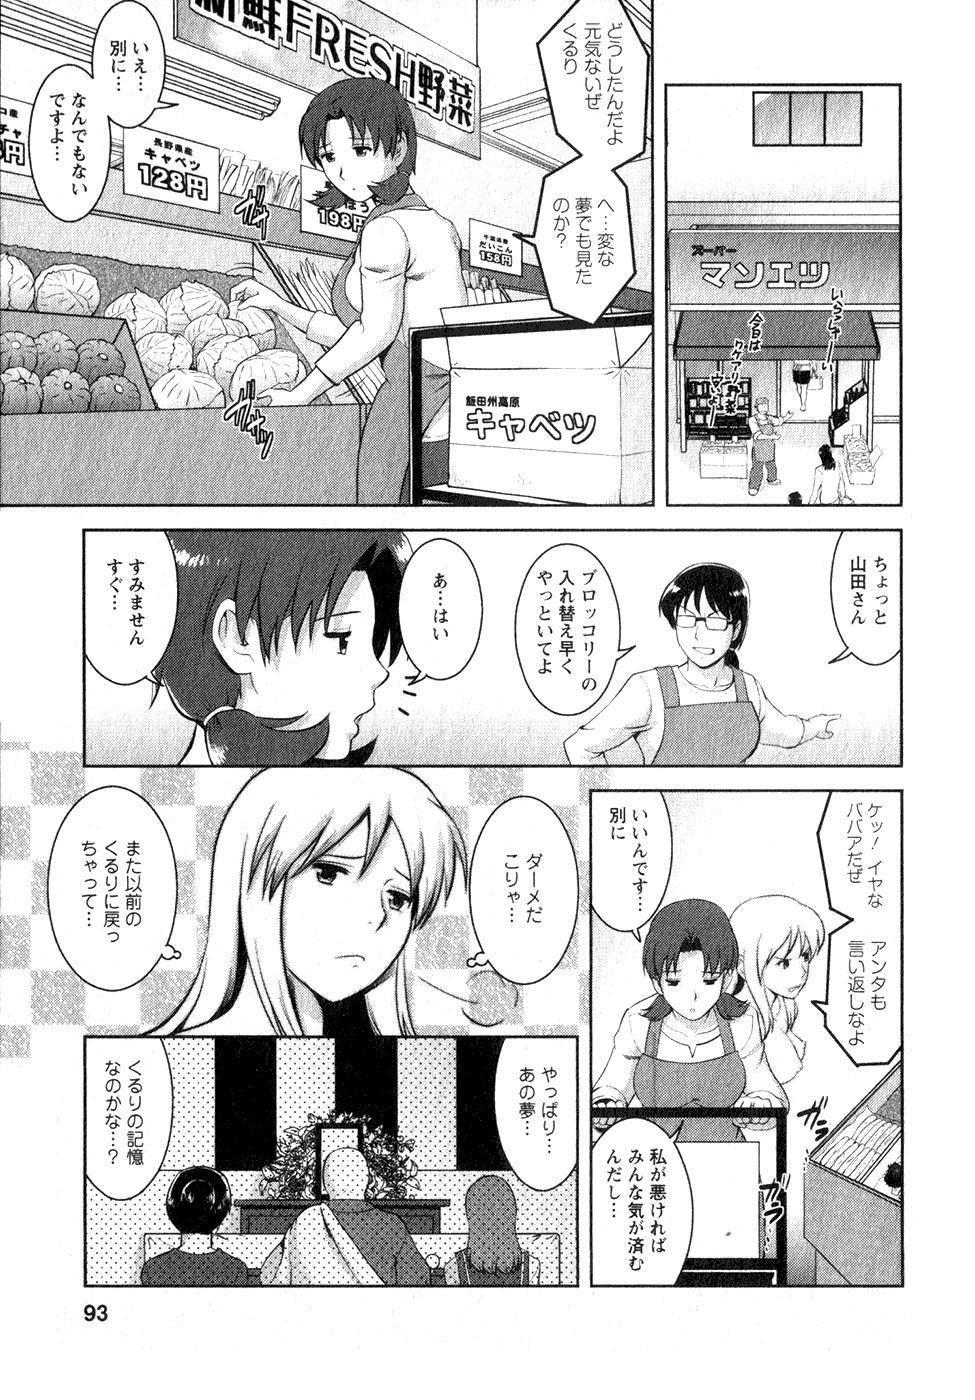 [Saigado] Kururi-san to Hirari-san Vol. 1 (Complete) 91